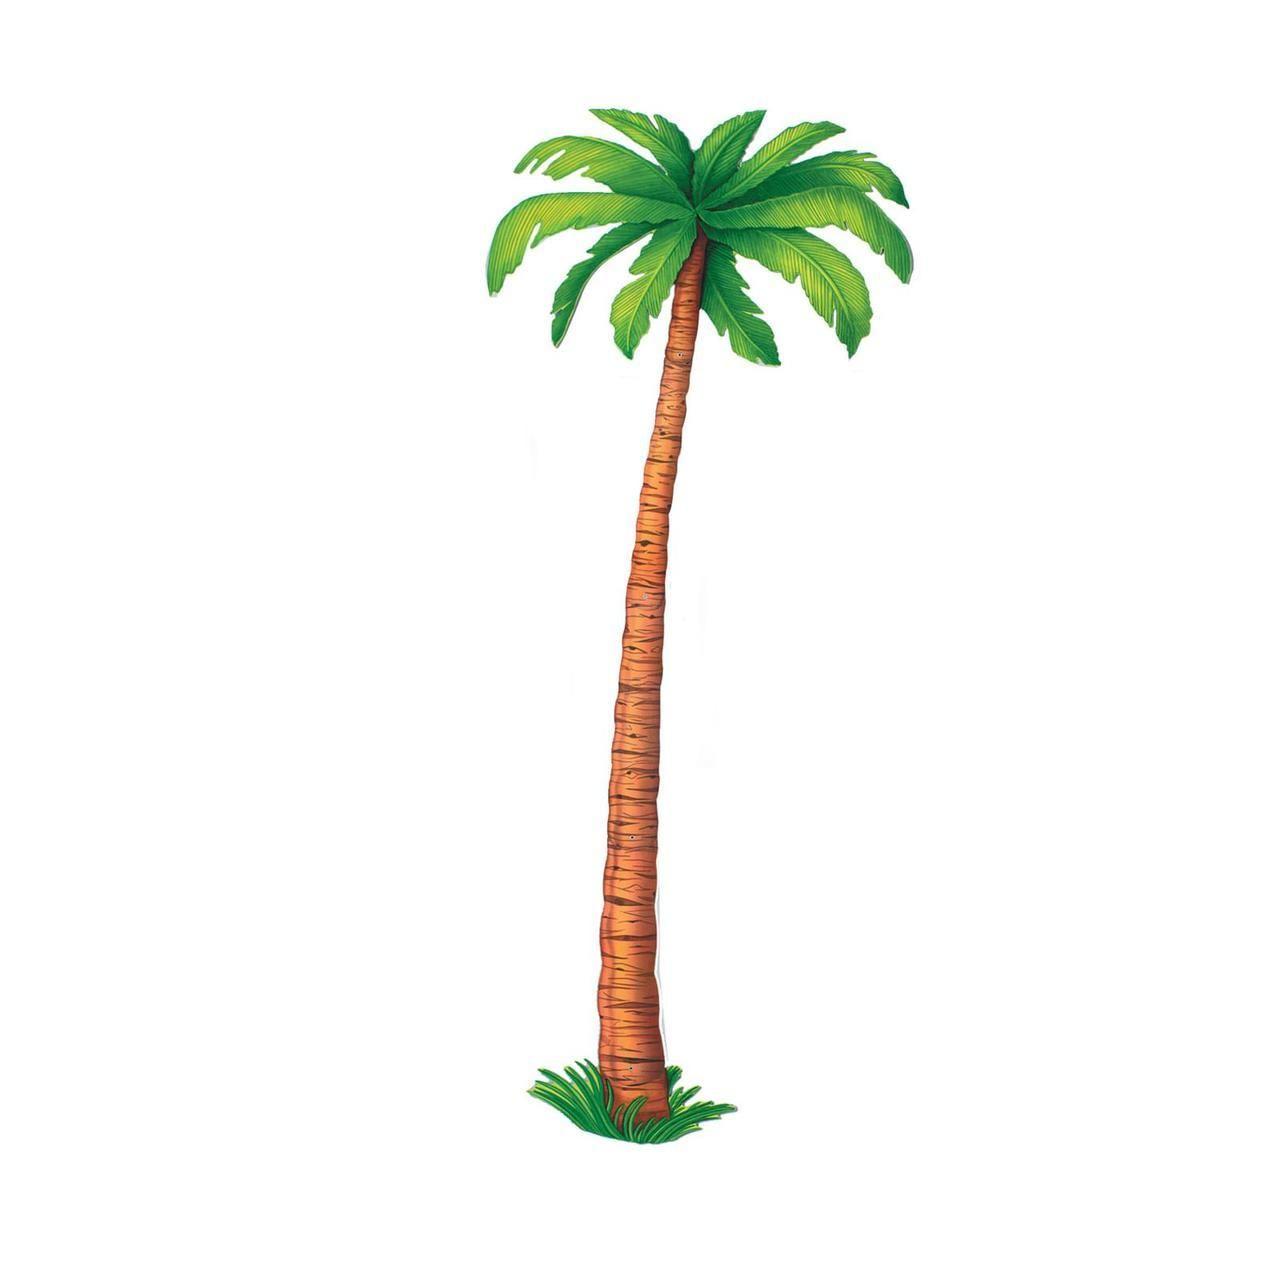 6 jointed palm tree cutout paper palm tree moana